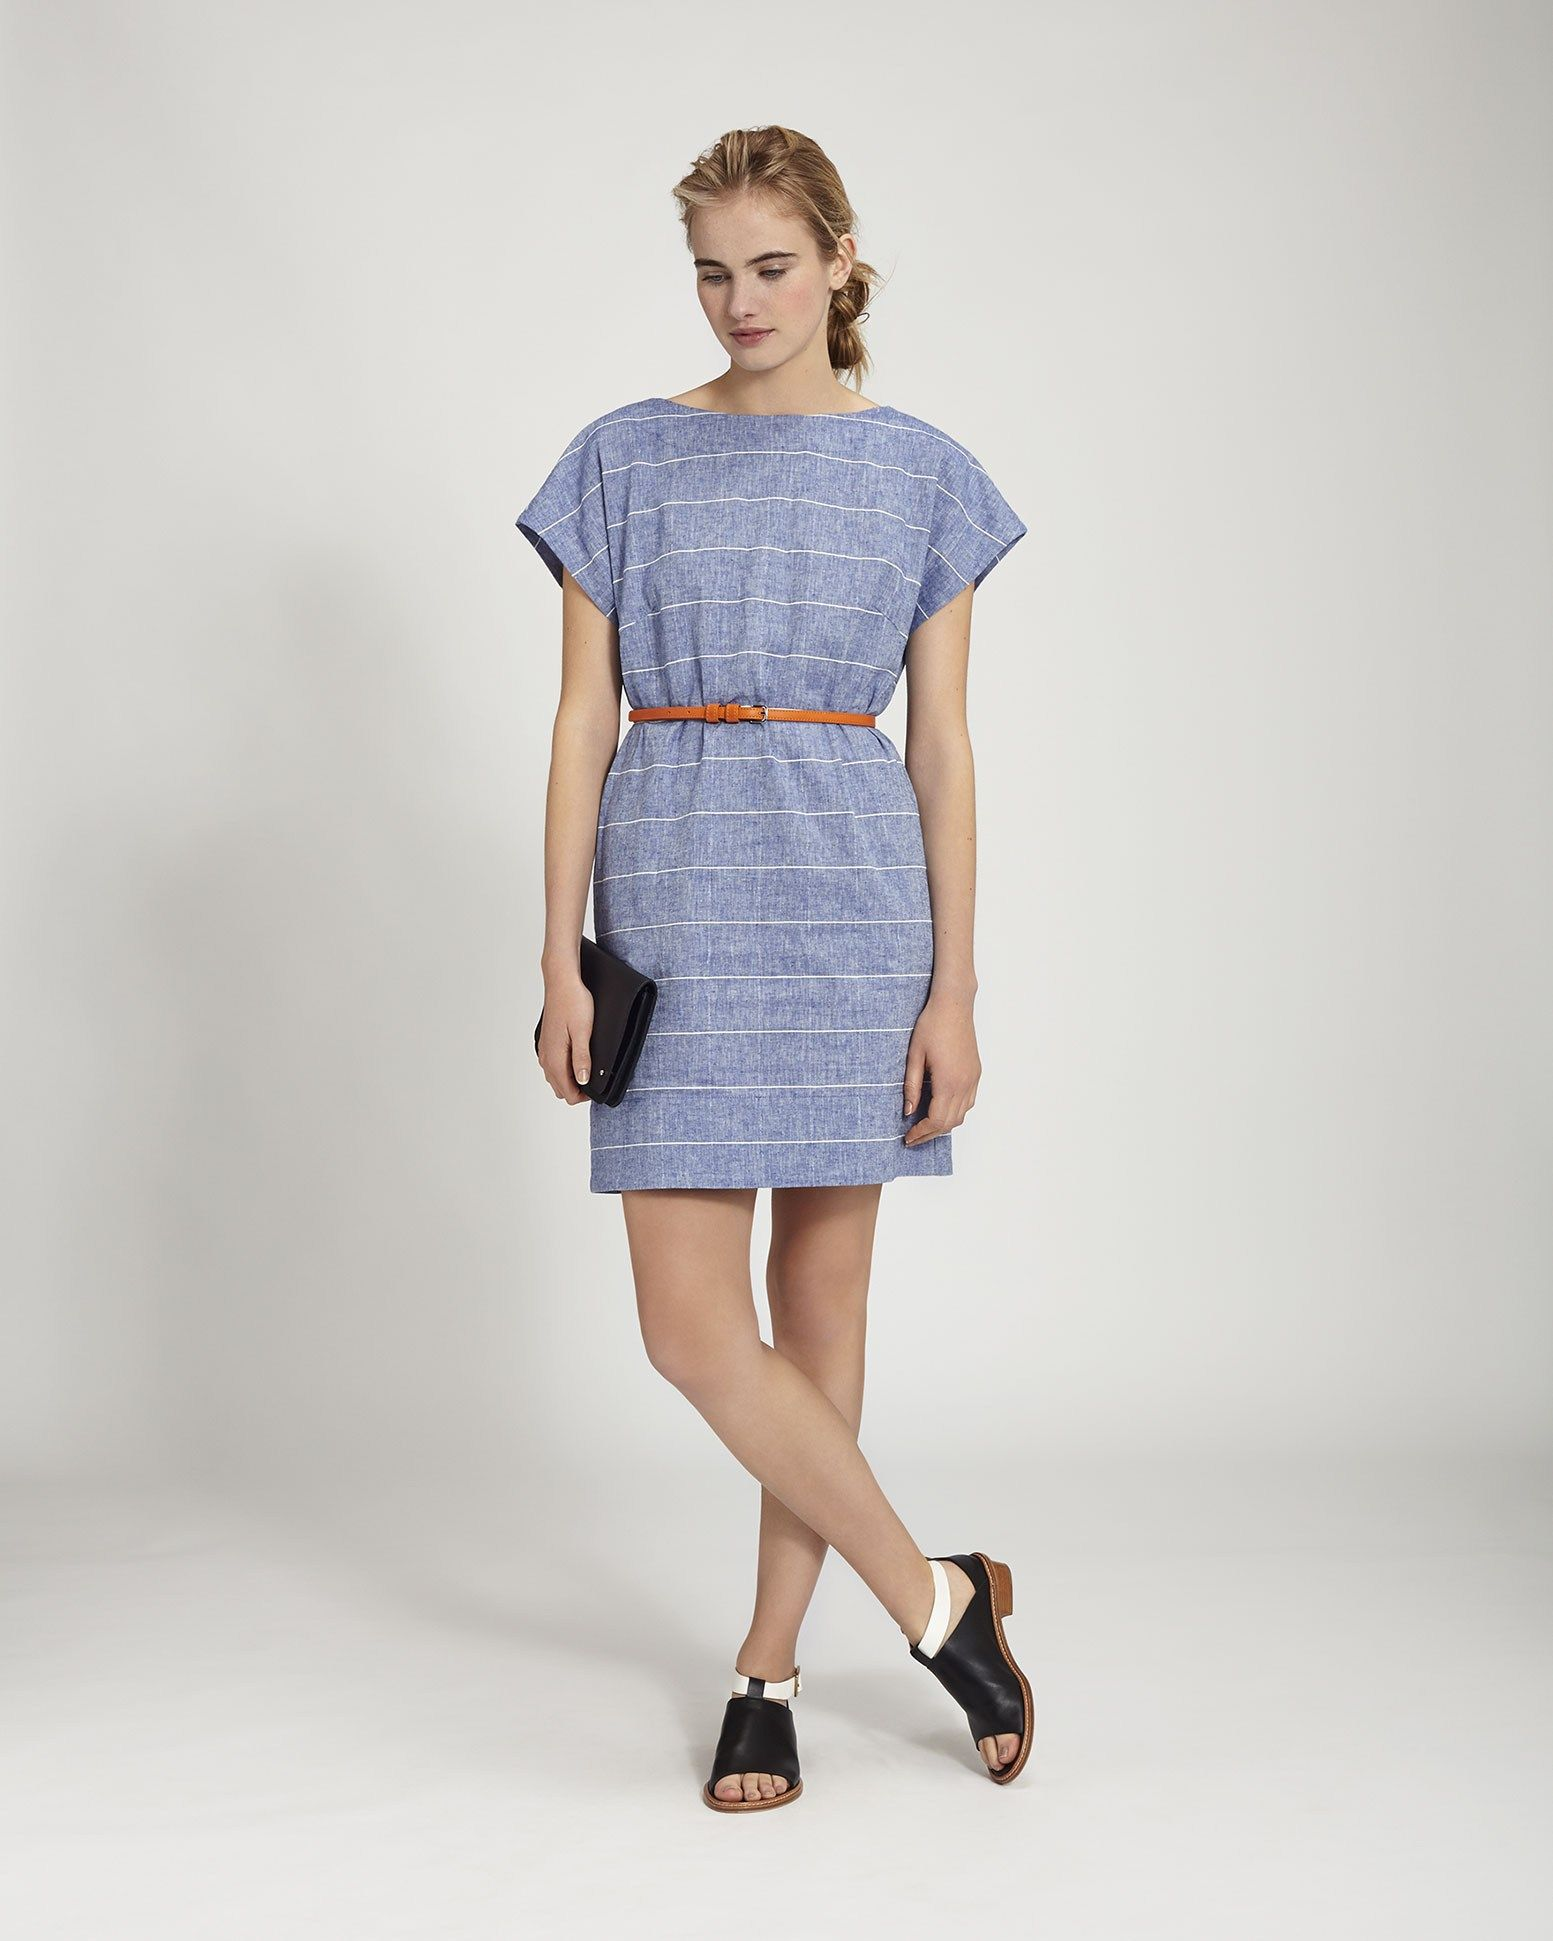 a25da5c7fc7 Women s Chambray Linen Cotton Riva Dress